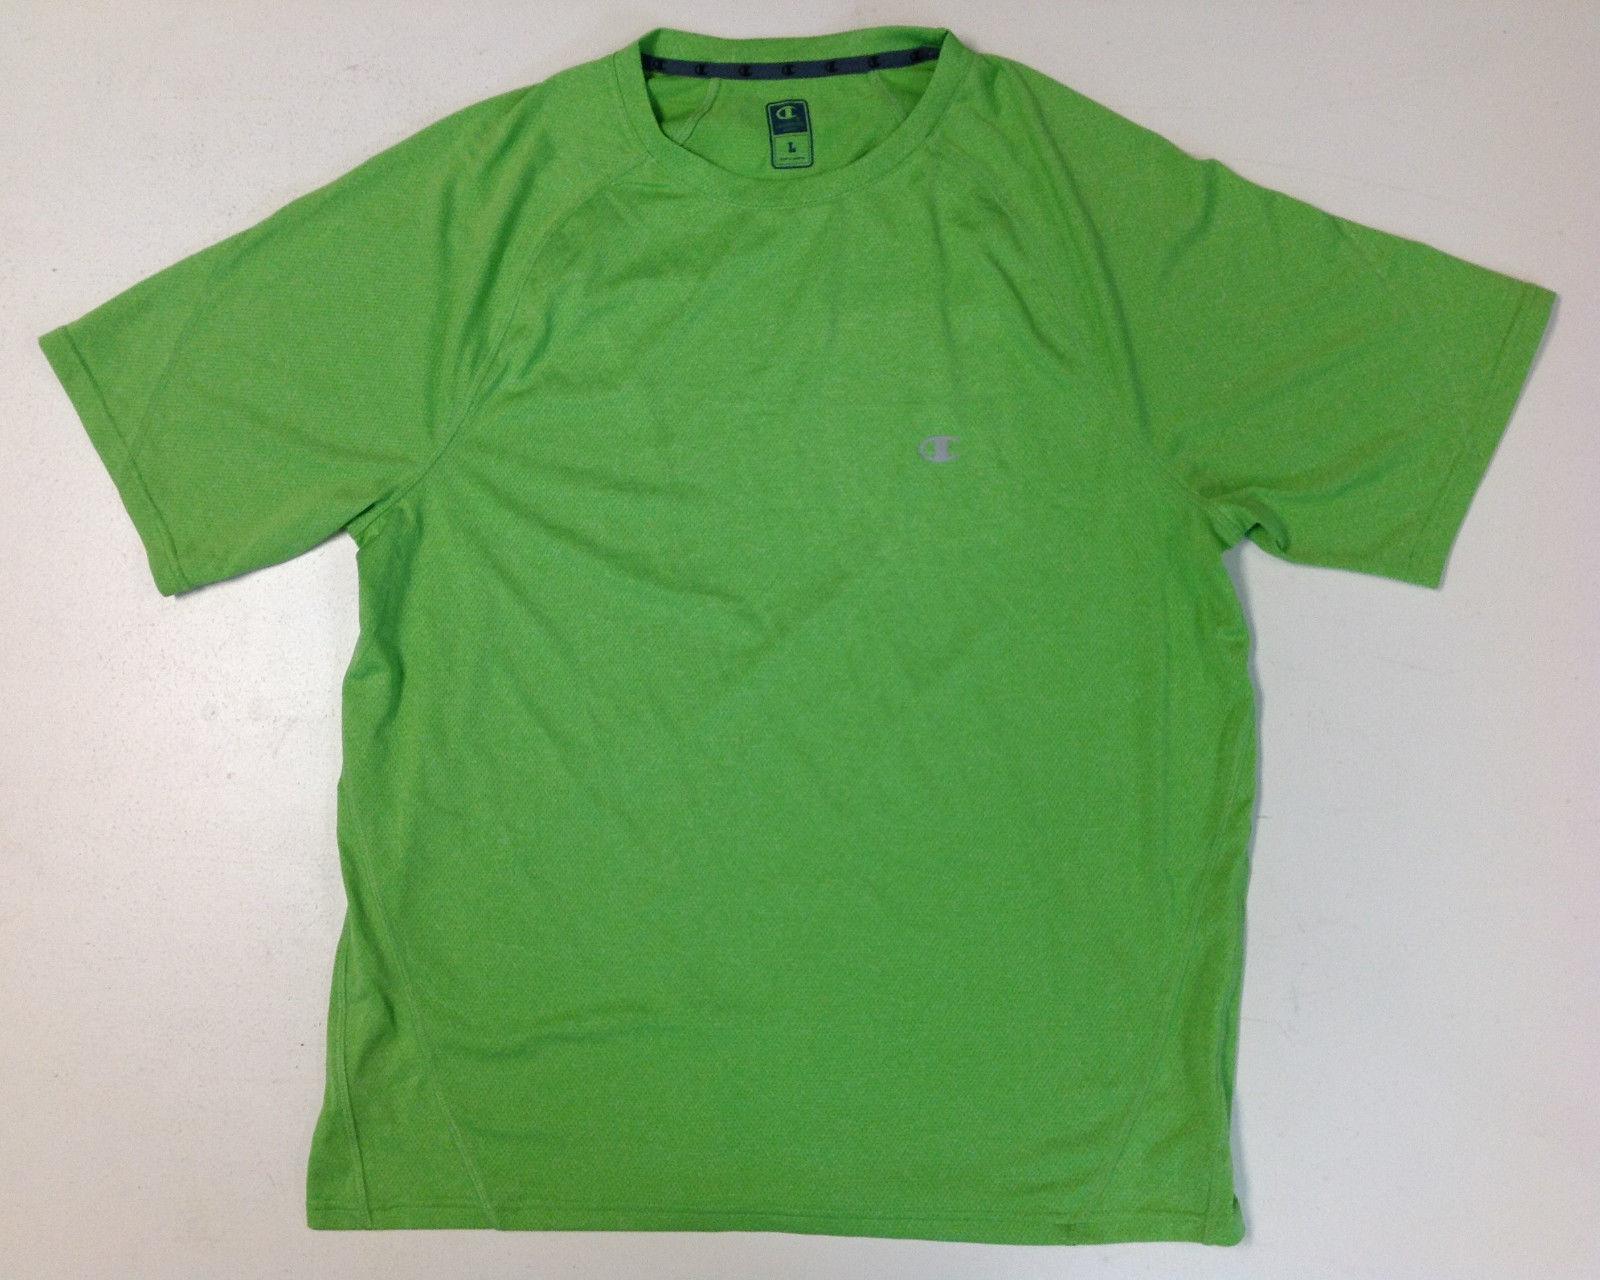 Champion Men's Short Sleeve Sport Tee, Size L